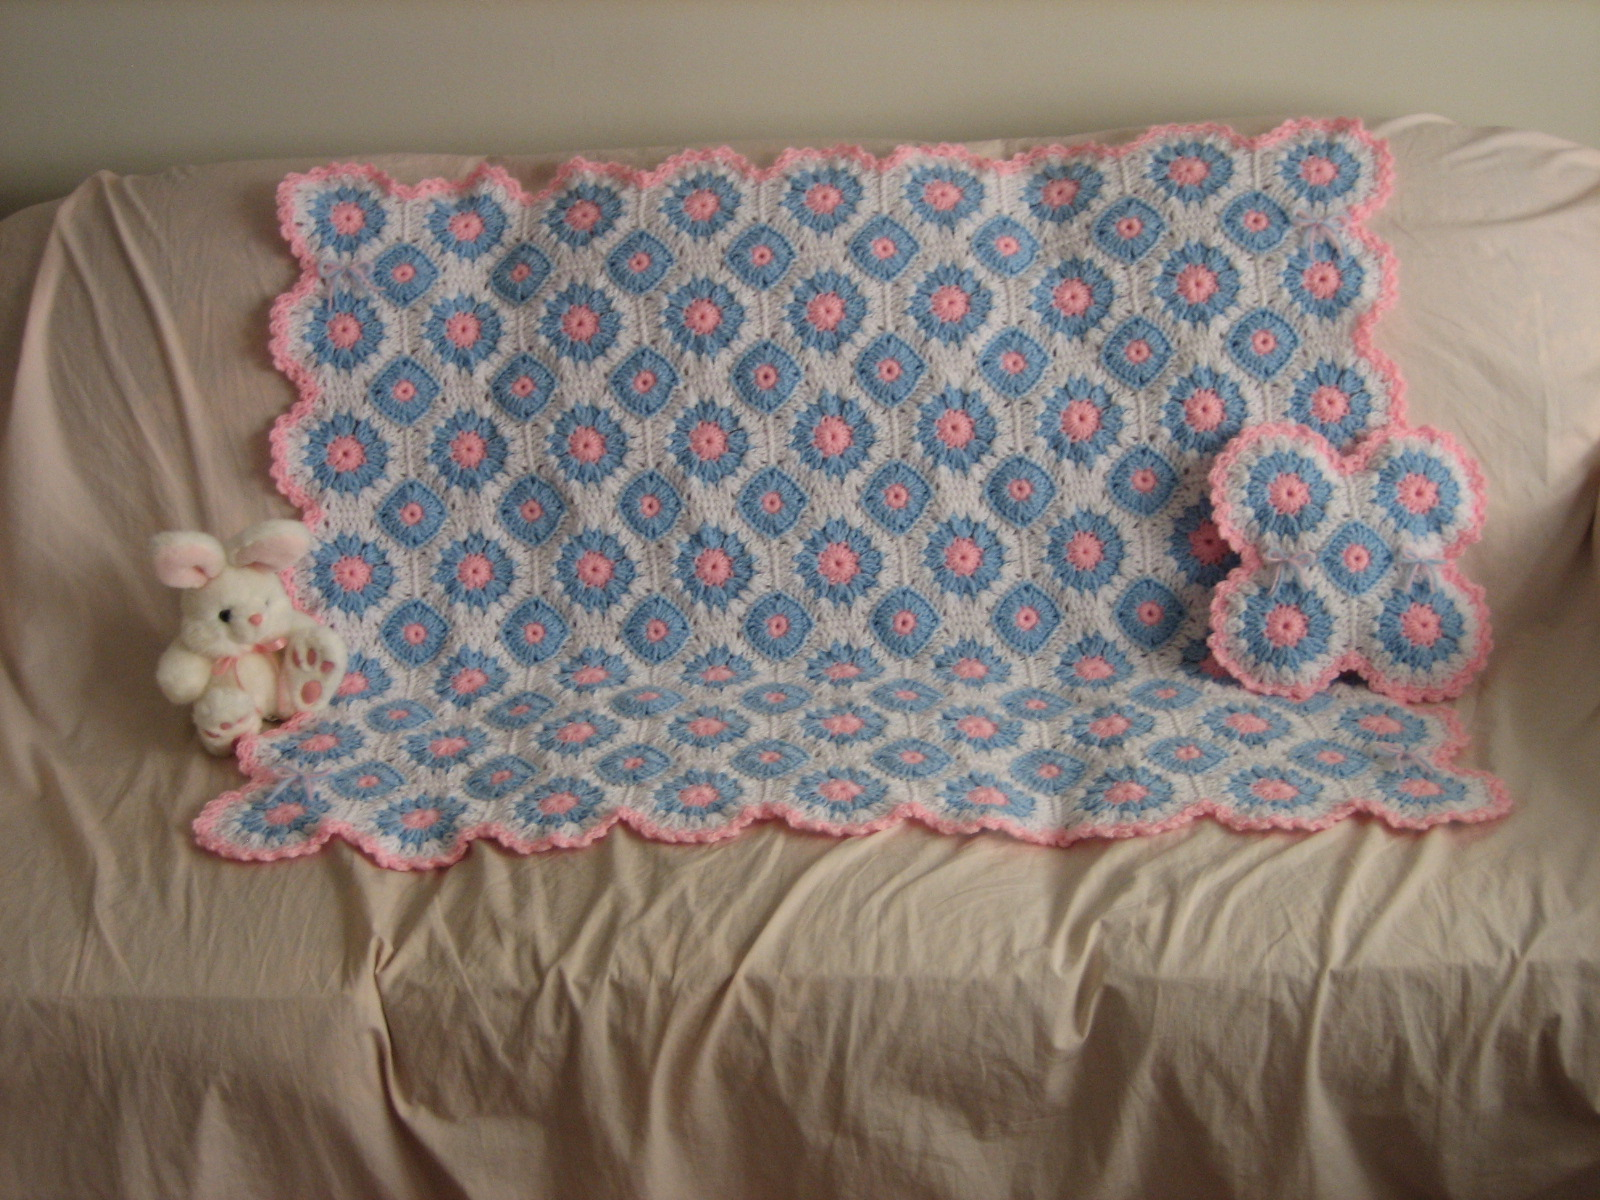 Lacy Crochet Afghan And Pillow Set Favecrafts Com